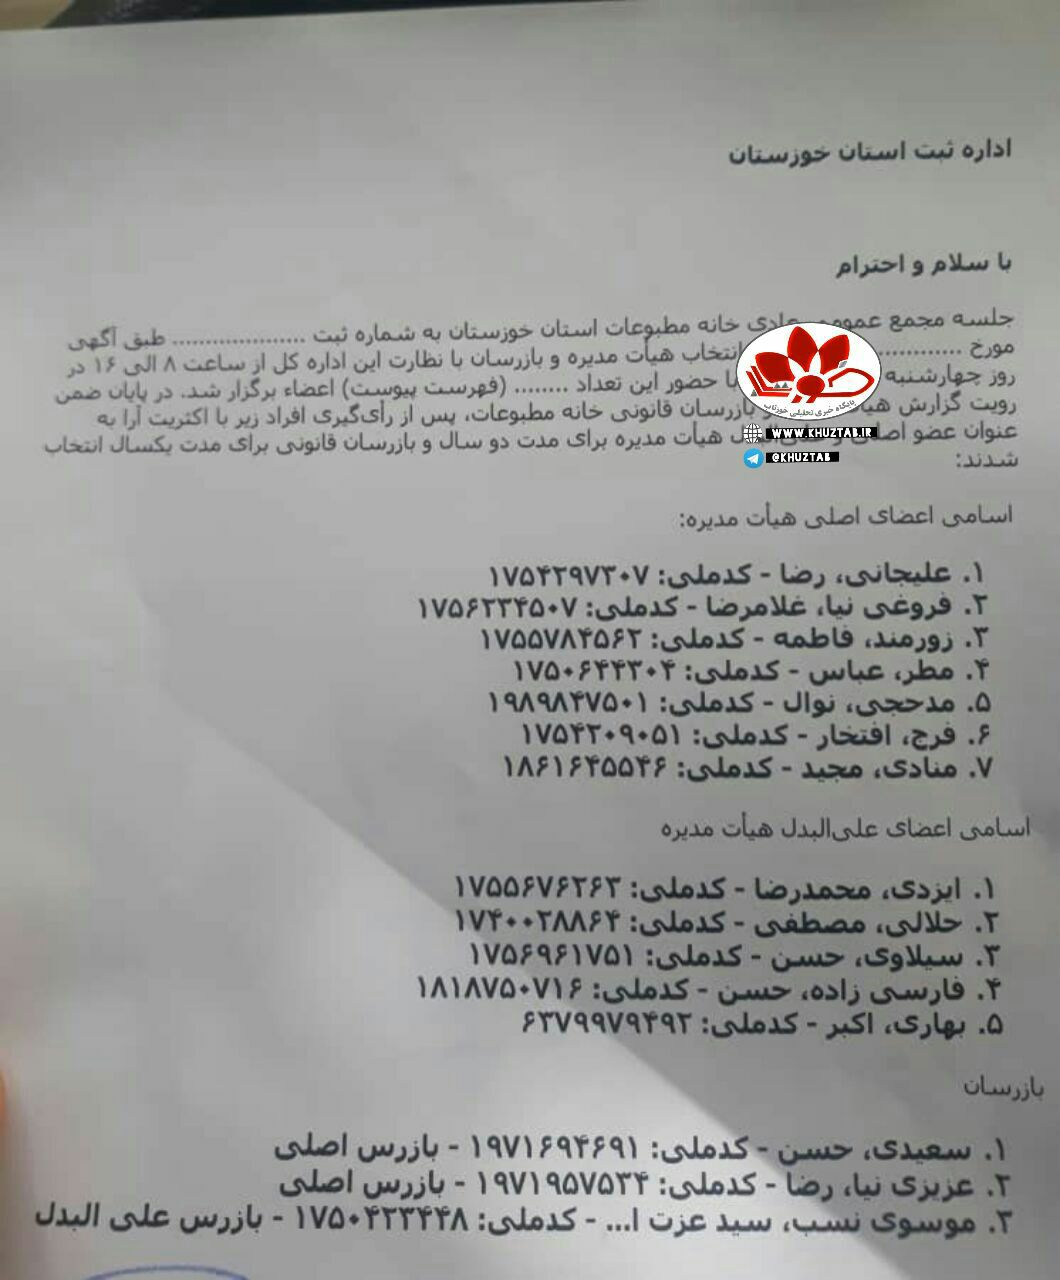 IMG 20200617 045145 433 اعضای هیات مدیره خانه مطبوعات خوزستان انتخاب شدند